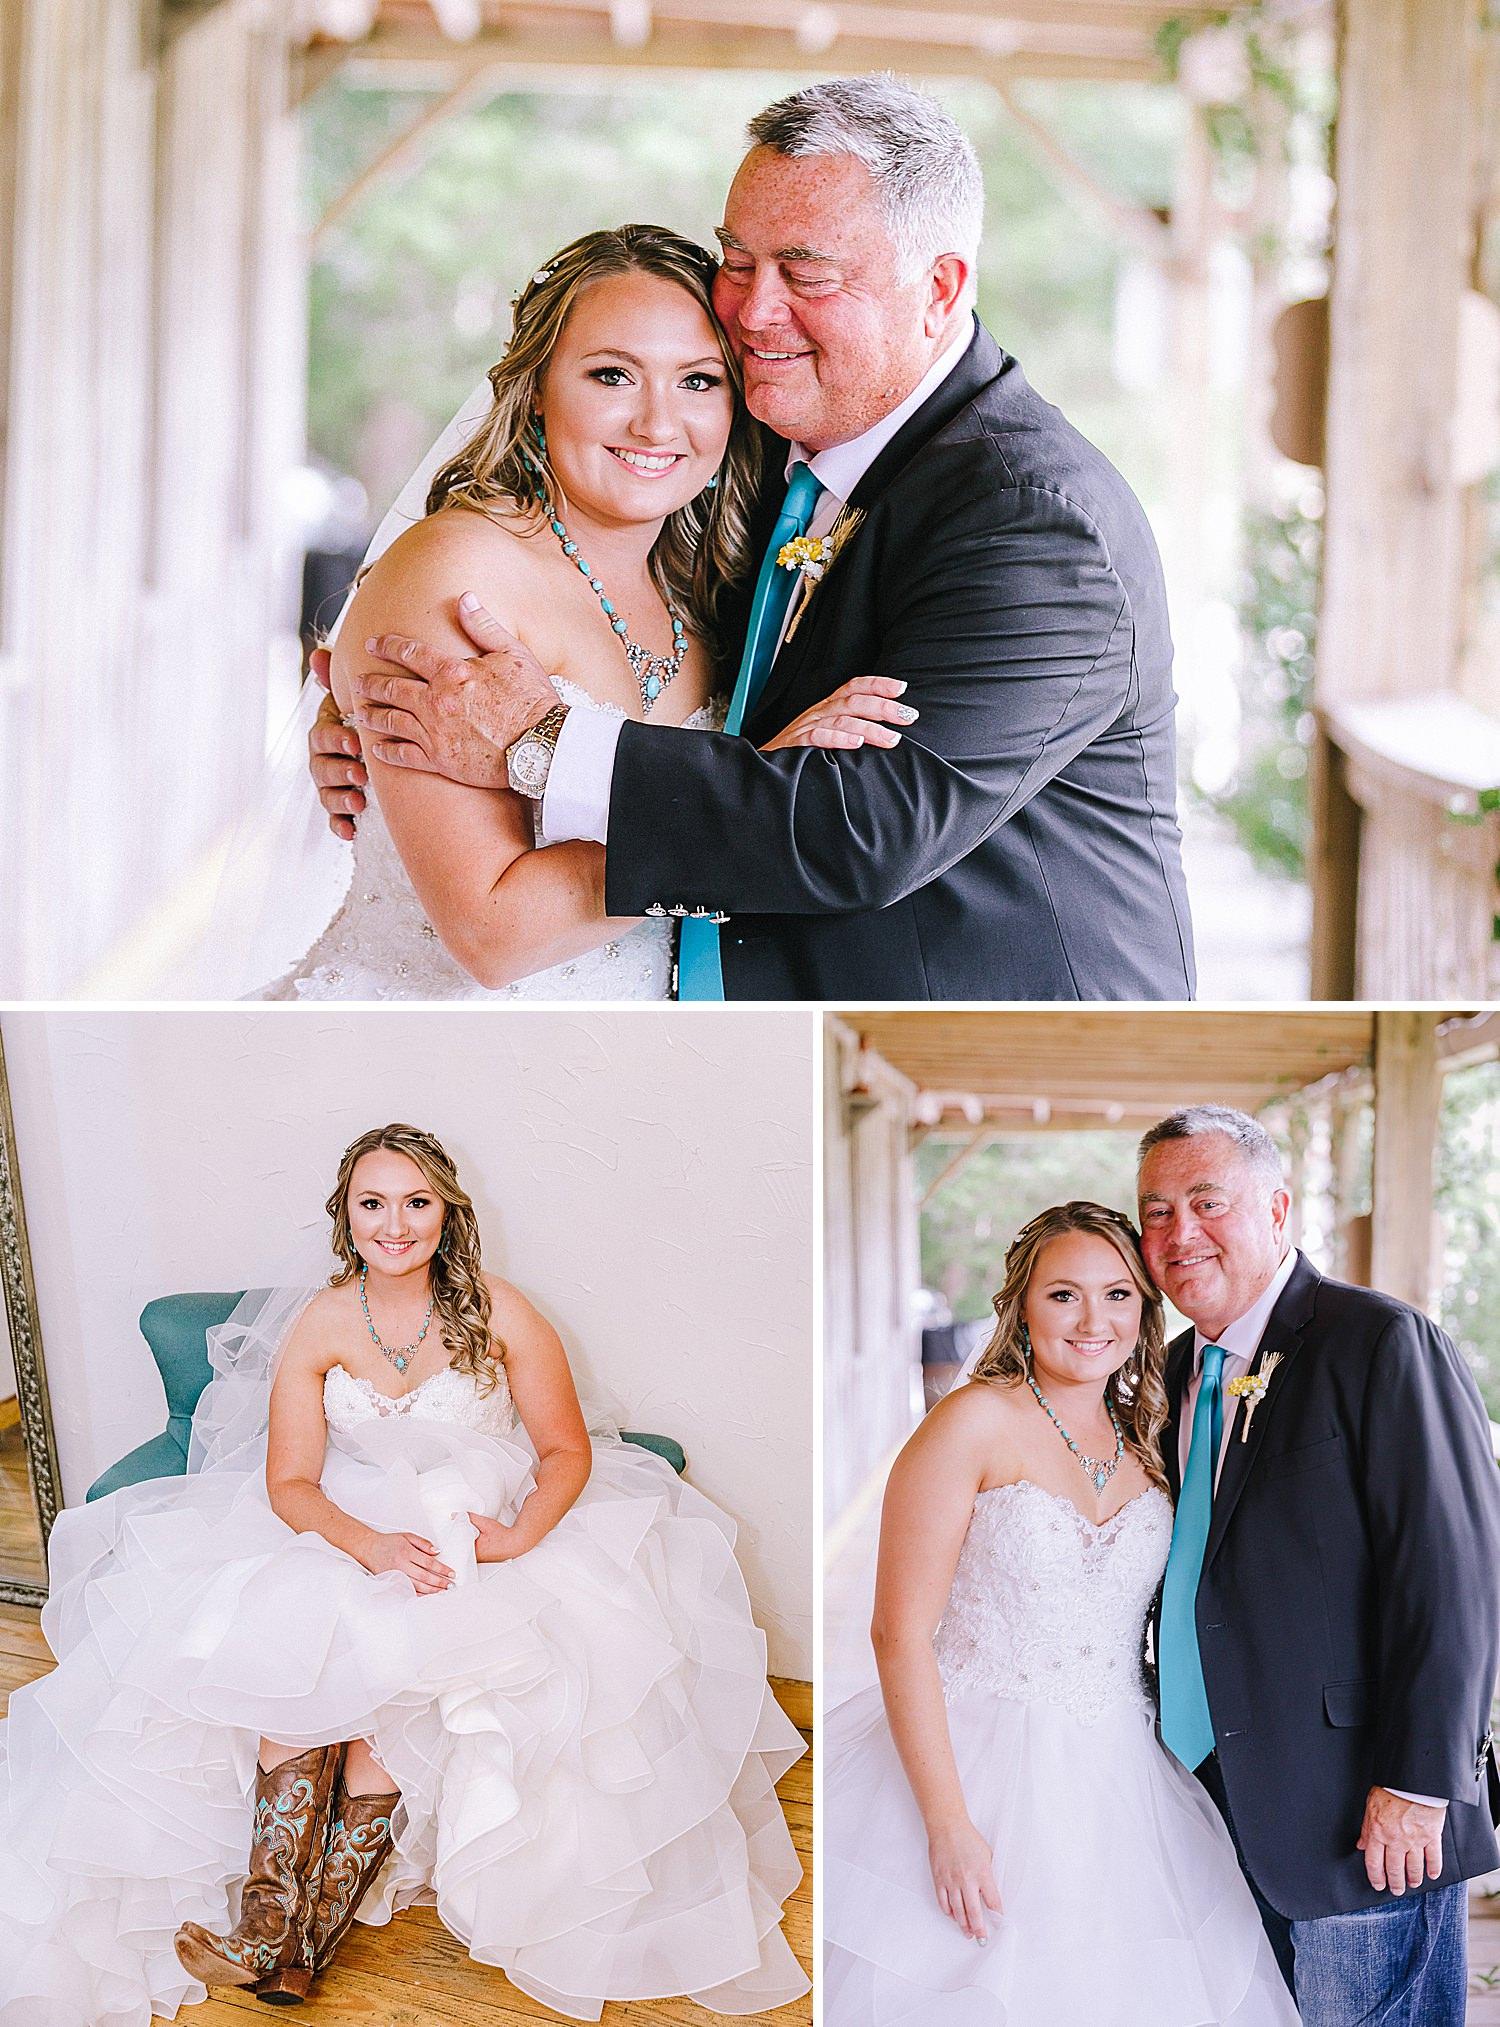 Carly-Barton-Photography-Old-Town-Texas-Rustic-Wedding-Photos-Sunflowers-Boots-Kyle-Texas_0028.jpg